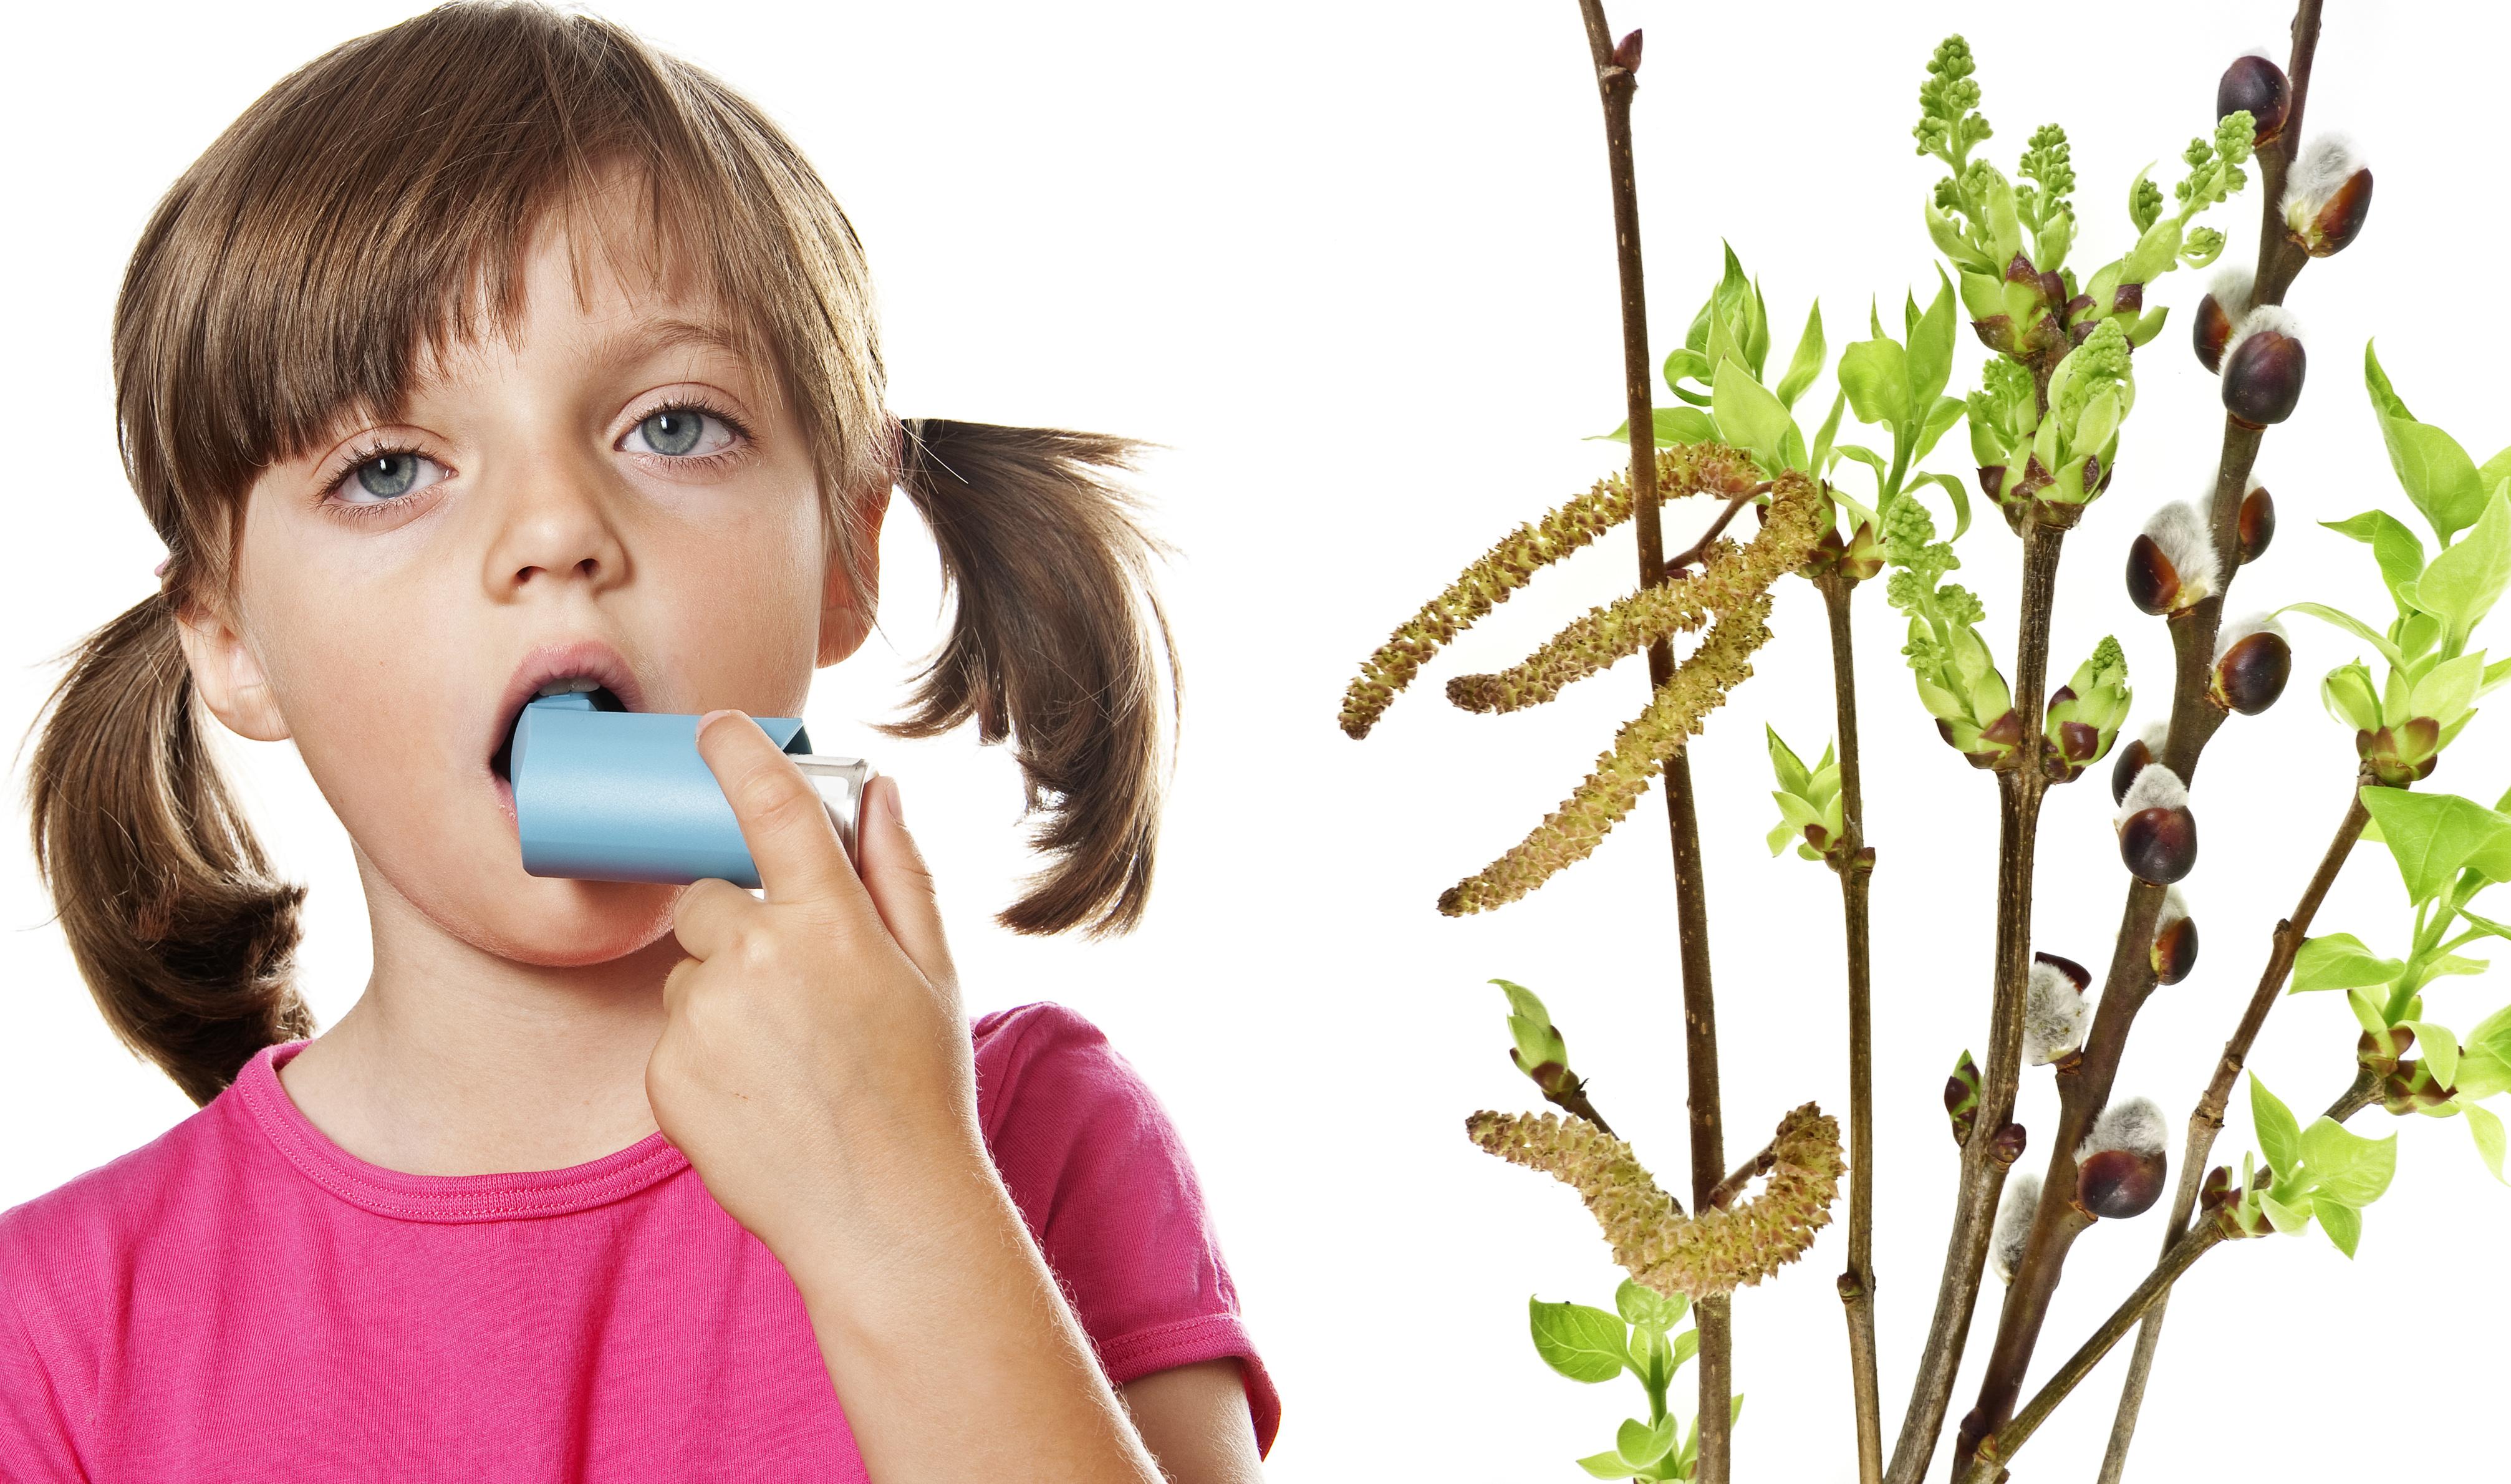 little girl with inhaler - respiratory problems